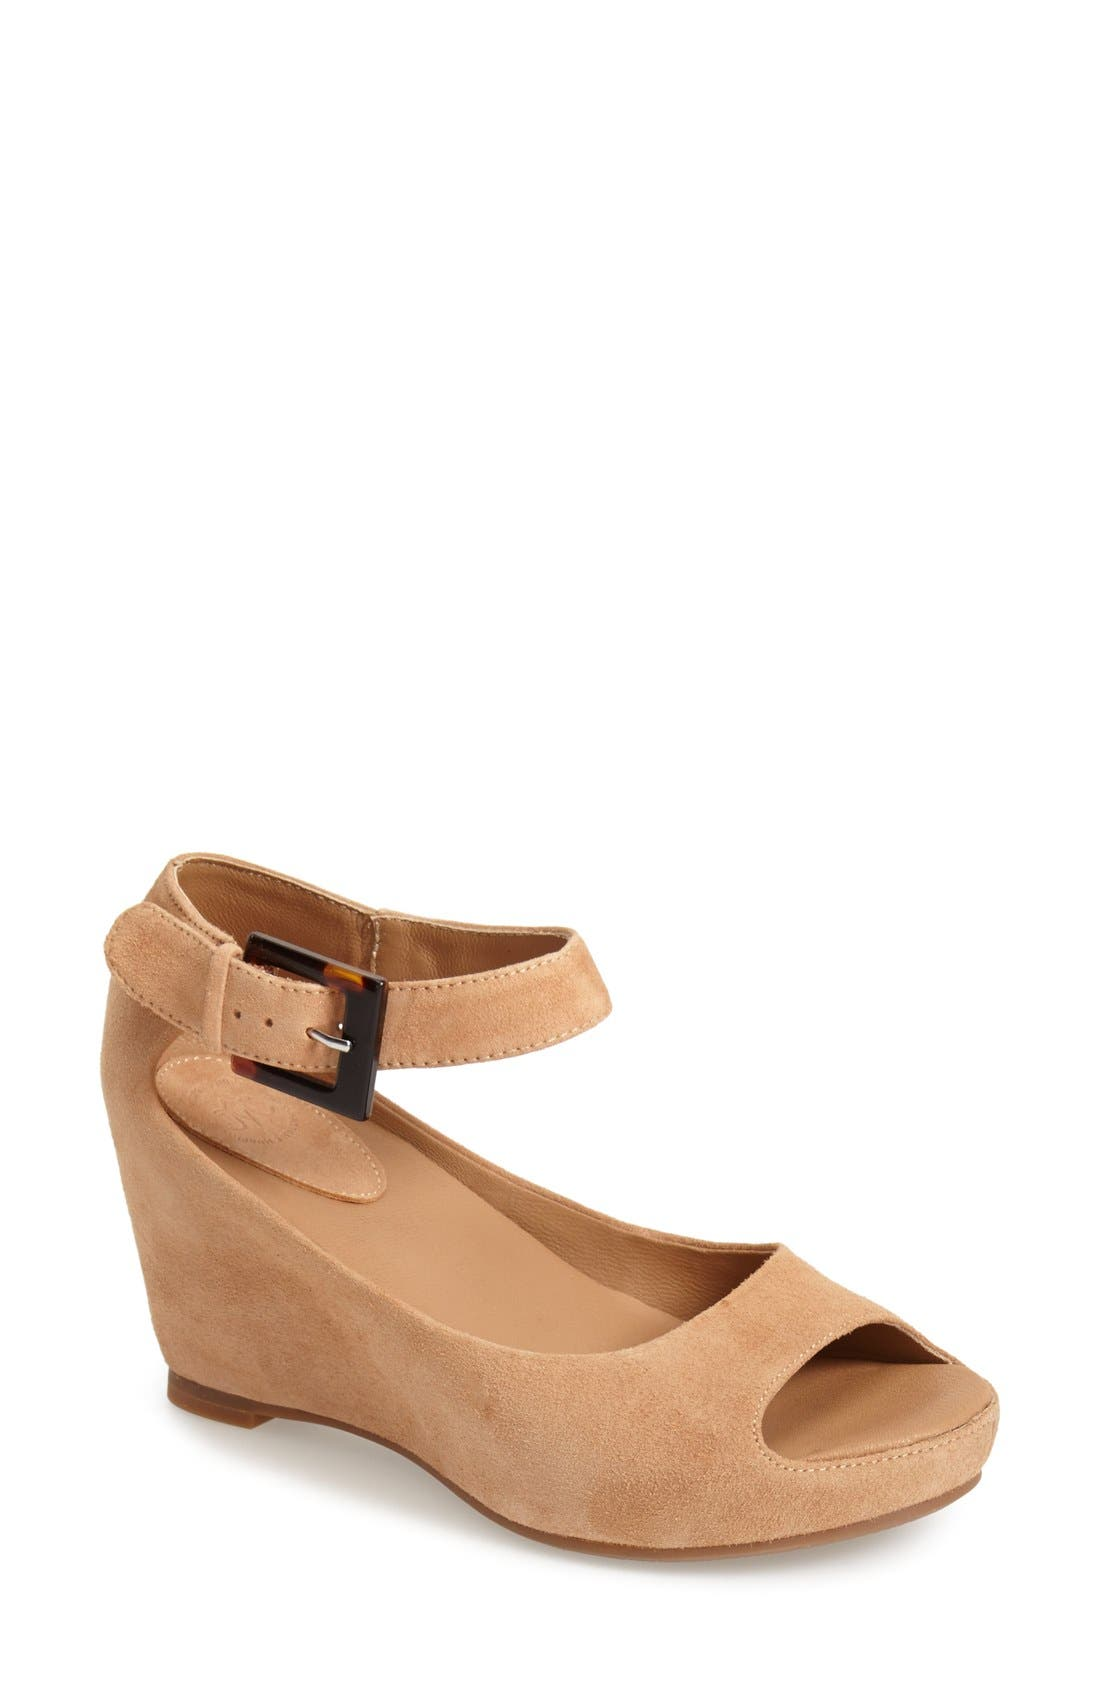 Alternate Image 1 Selected - Johnston & Murphy 'Tricia' Ankle Strap Sandal